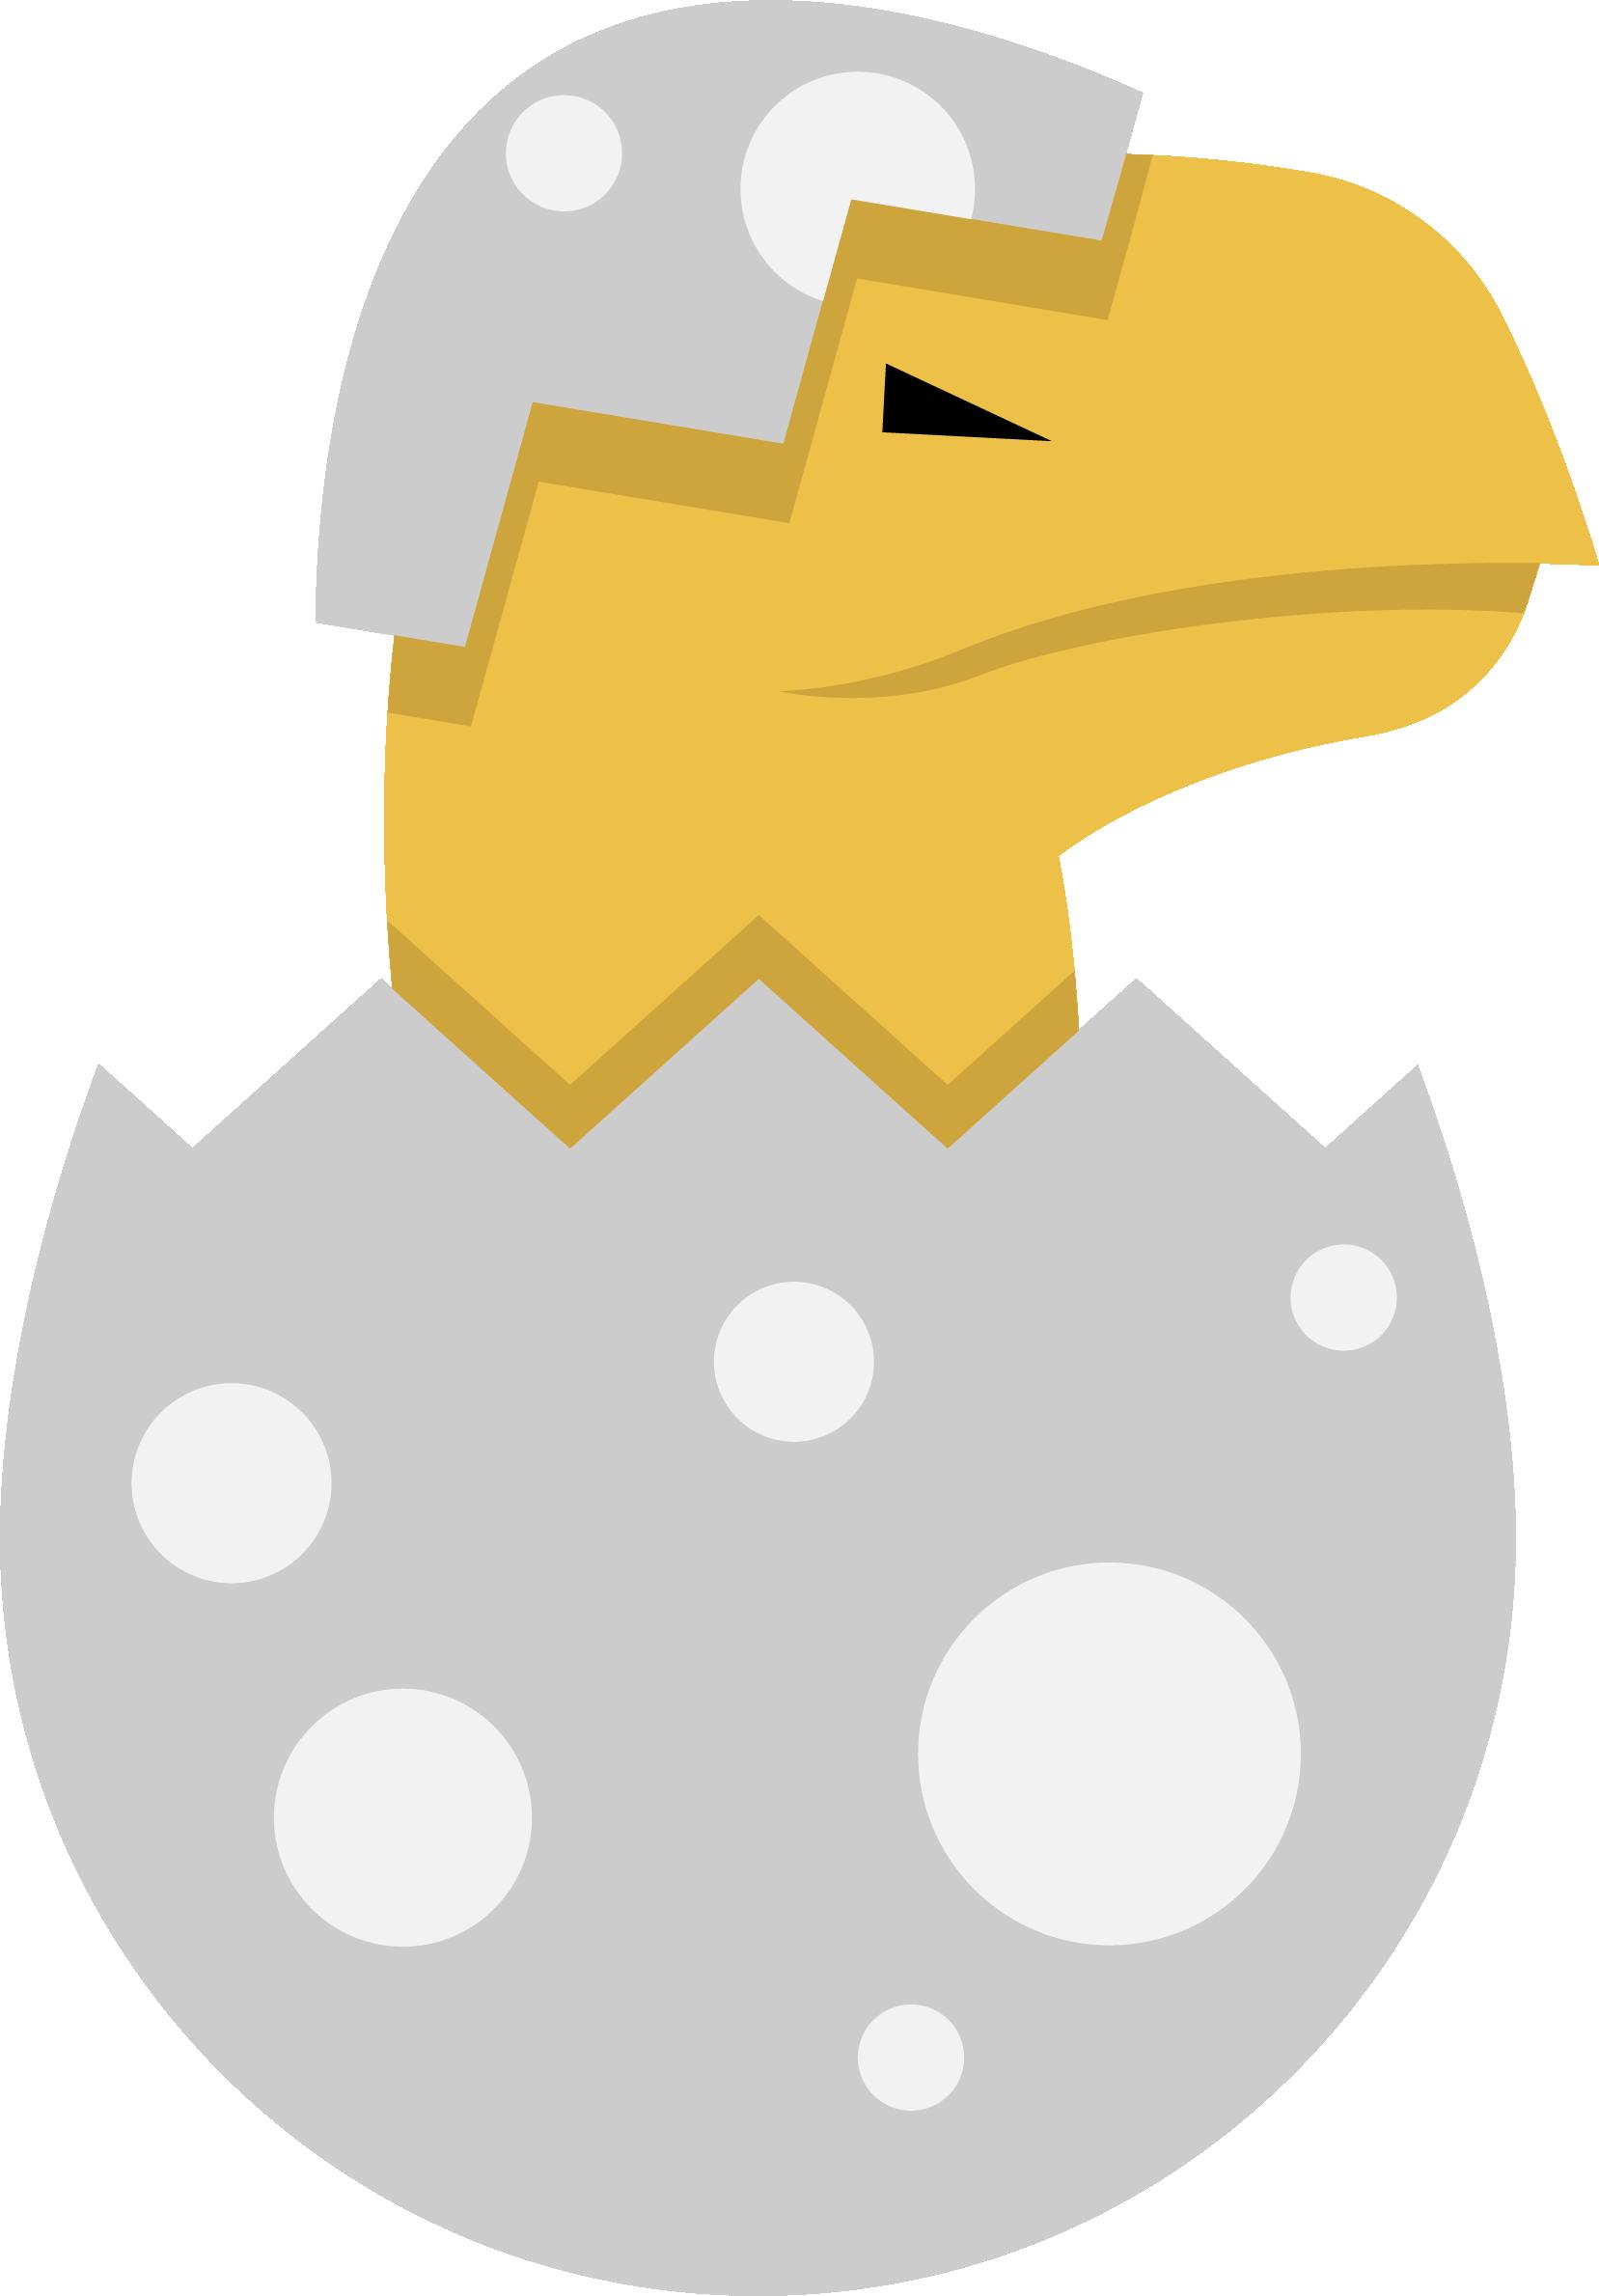 1657x2379 Dinosaur Egg Reptile Oviraptor